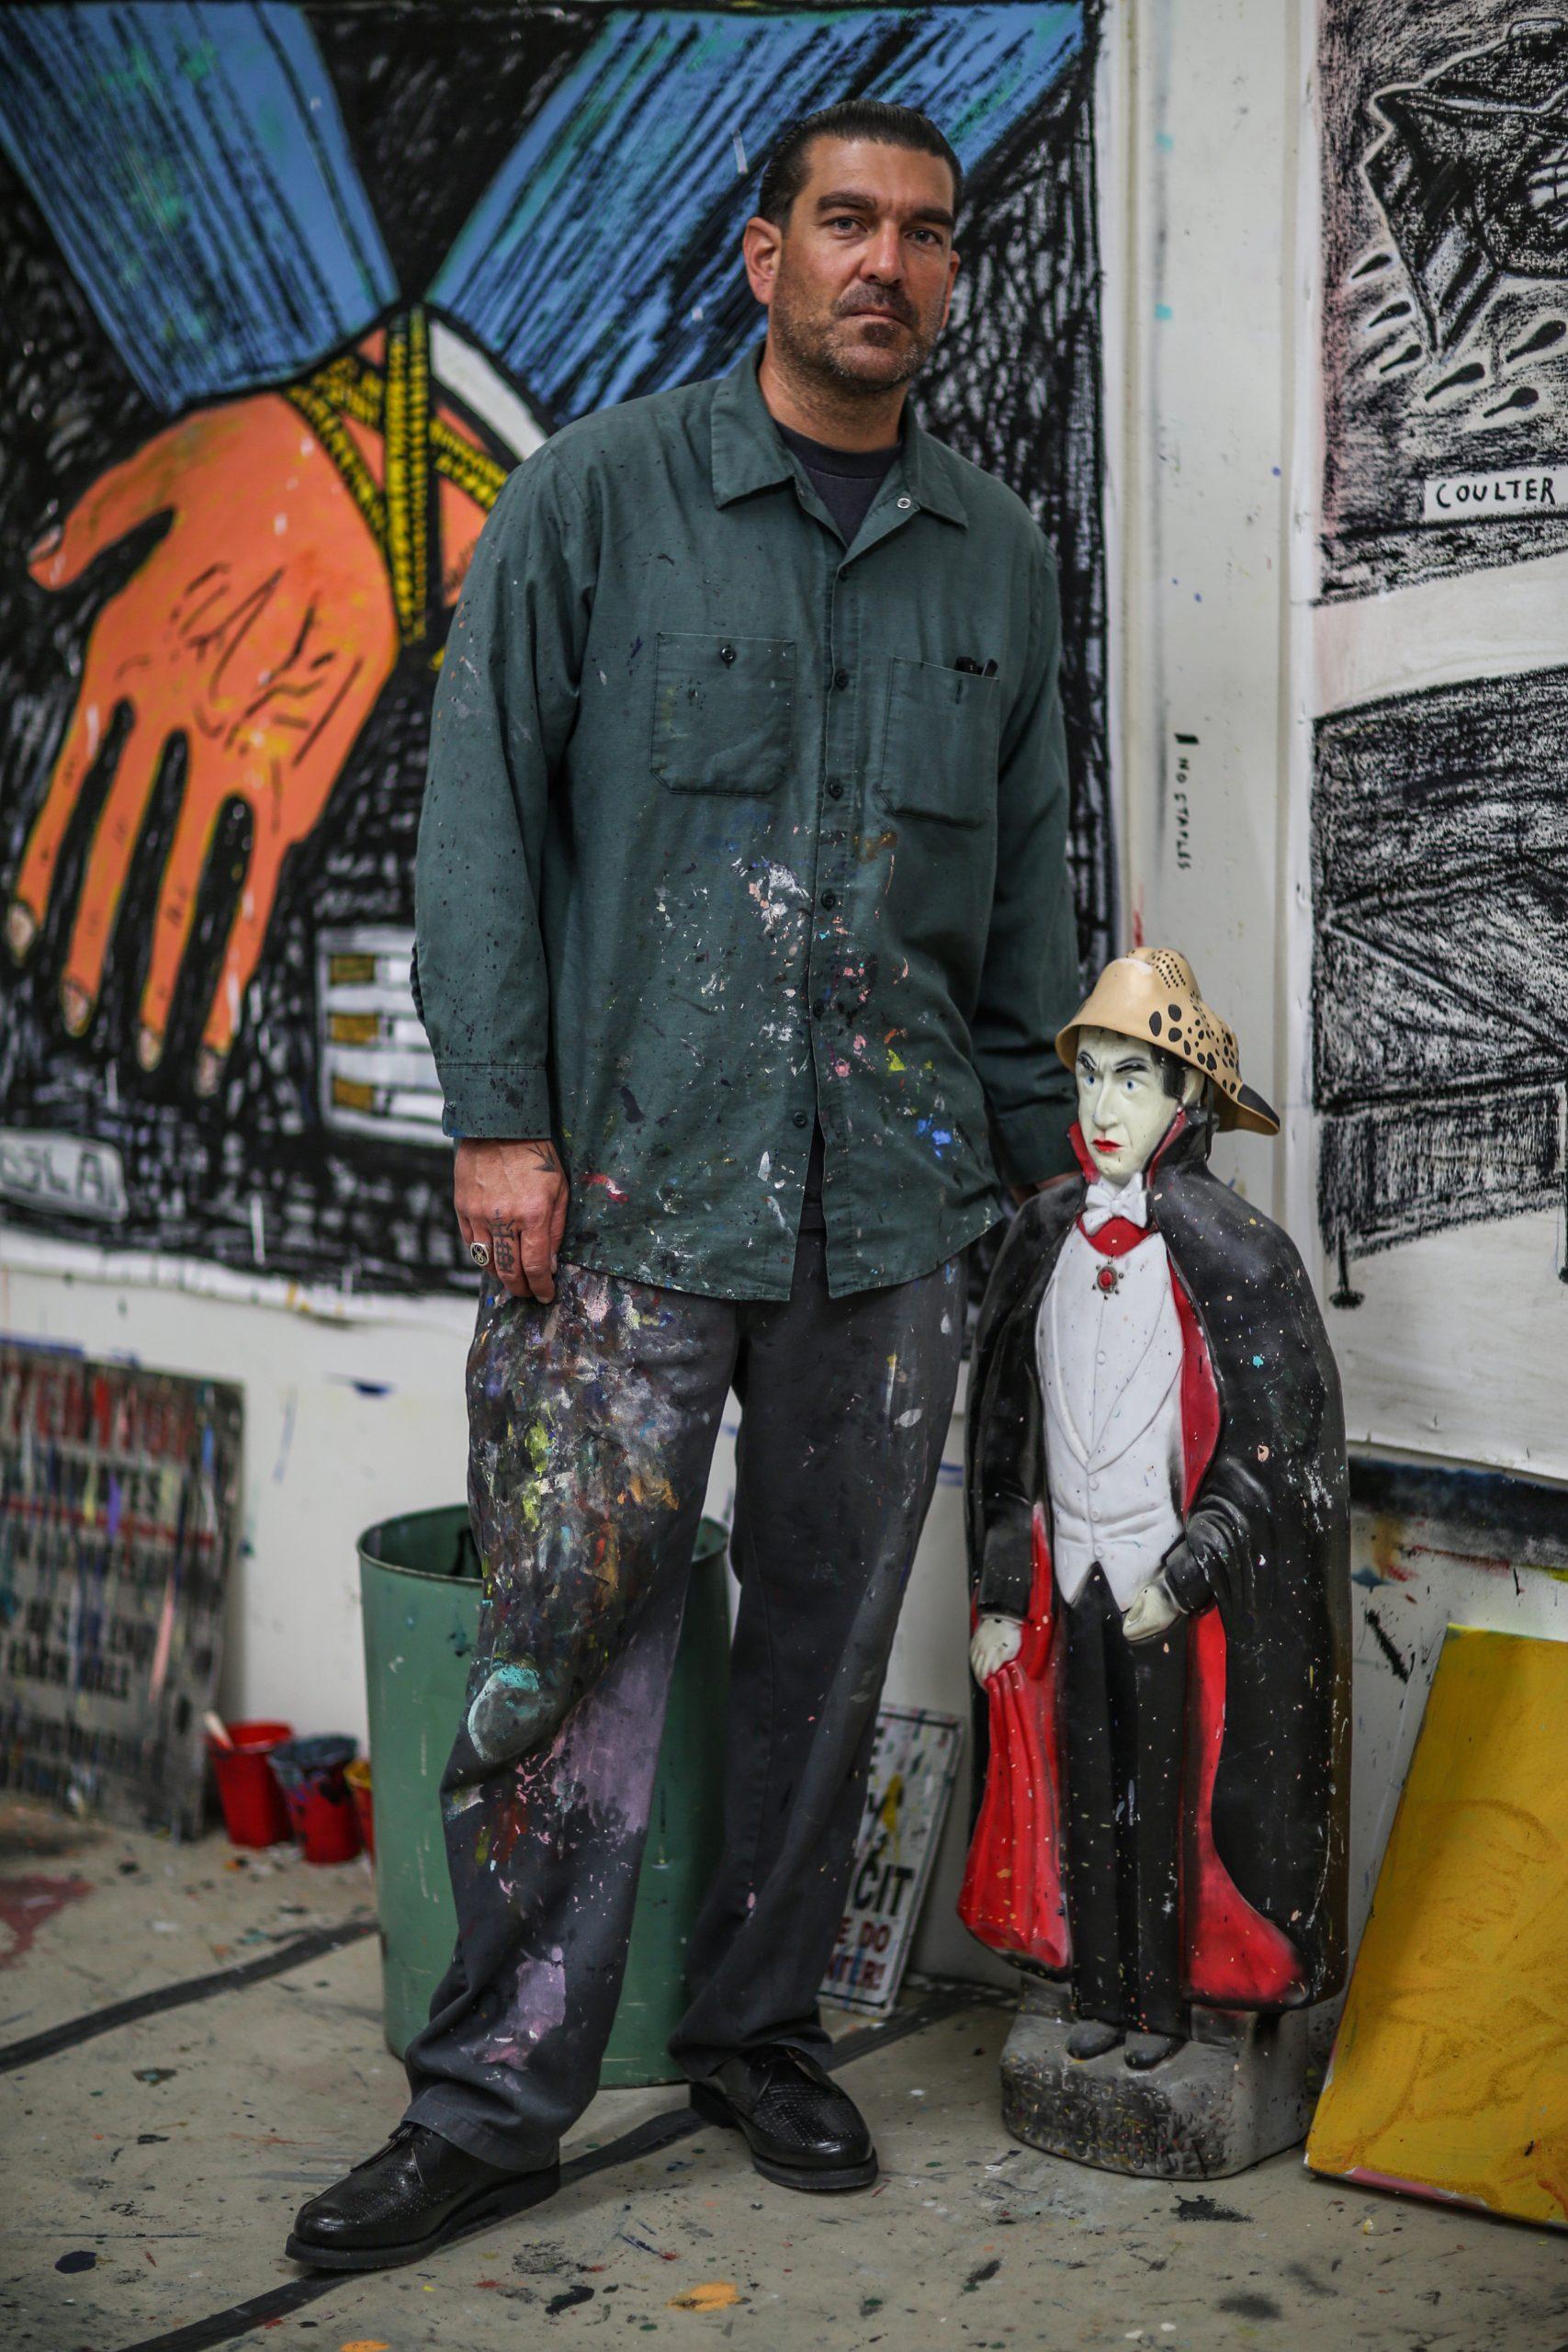 Coulter Jacobs studio dracula figure